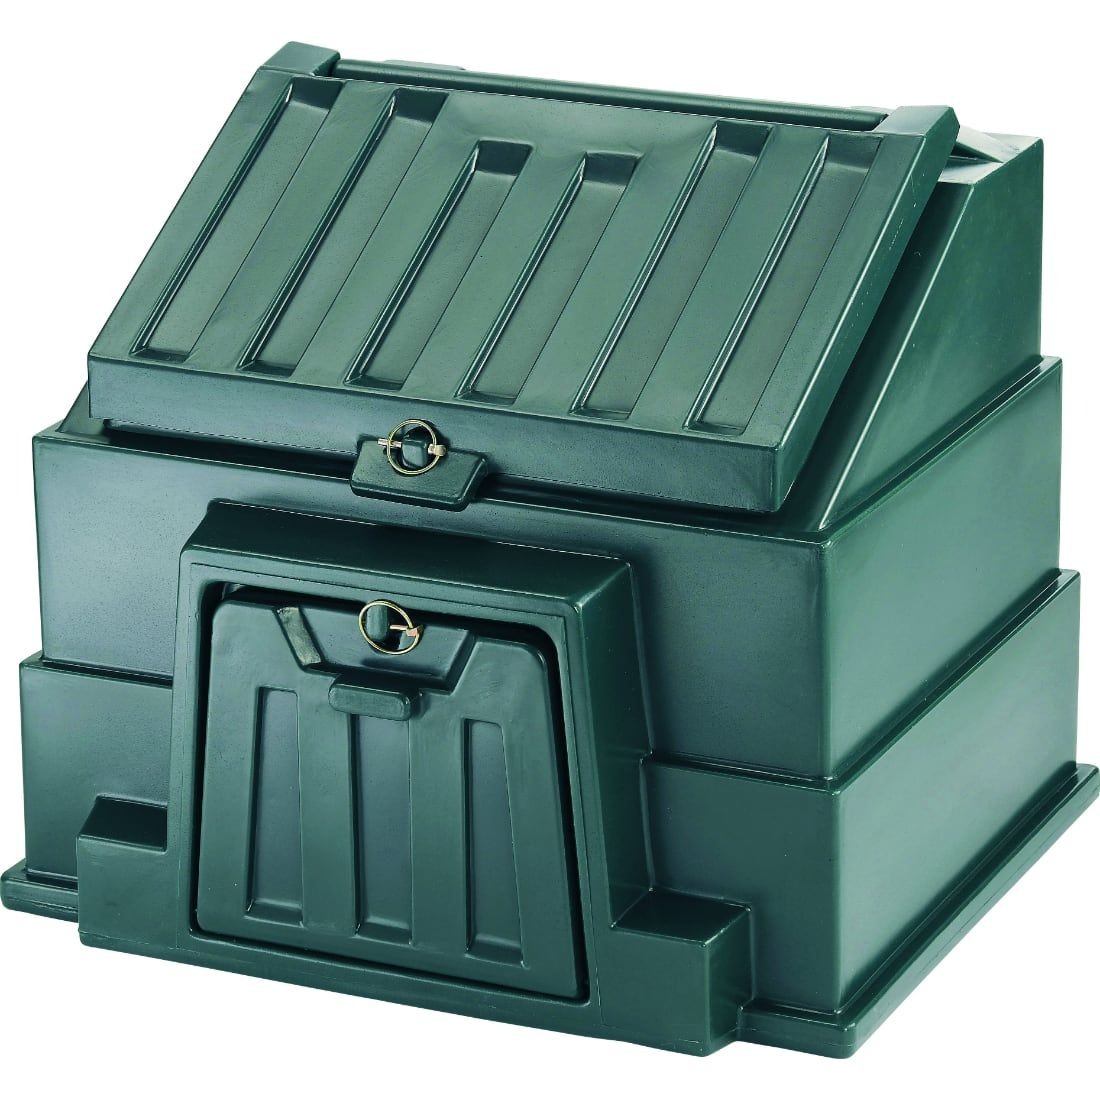 Photograph of Harlequin CB1 Plastic Coal Bunker - Green